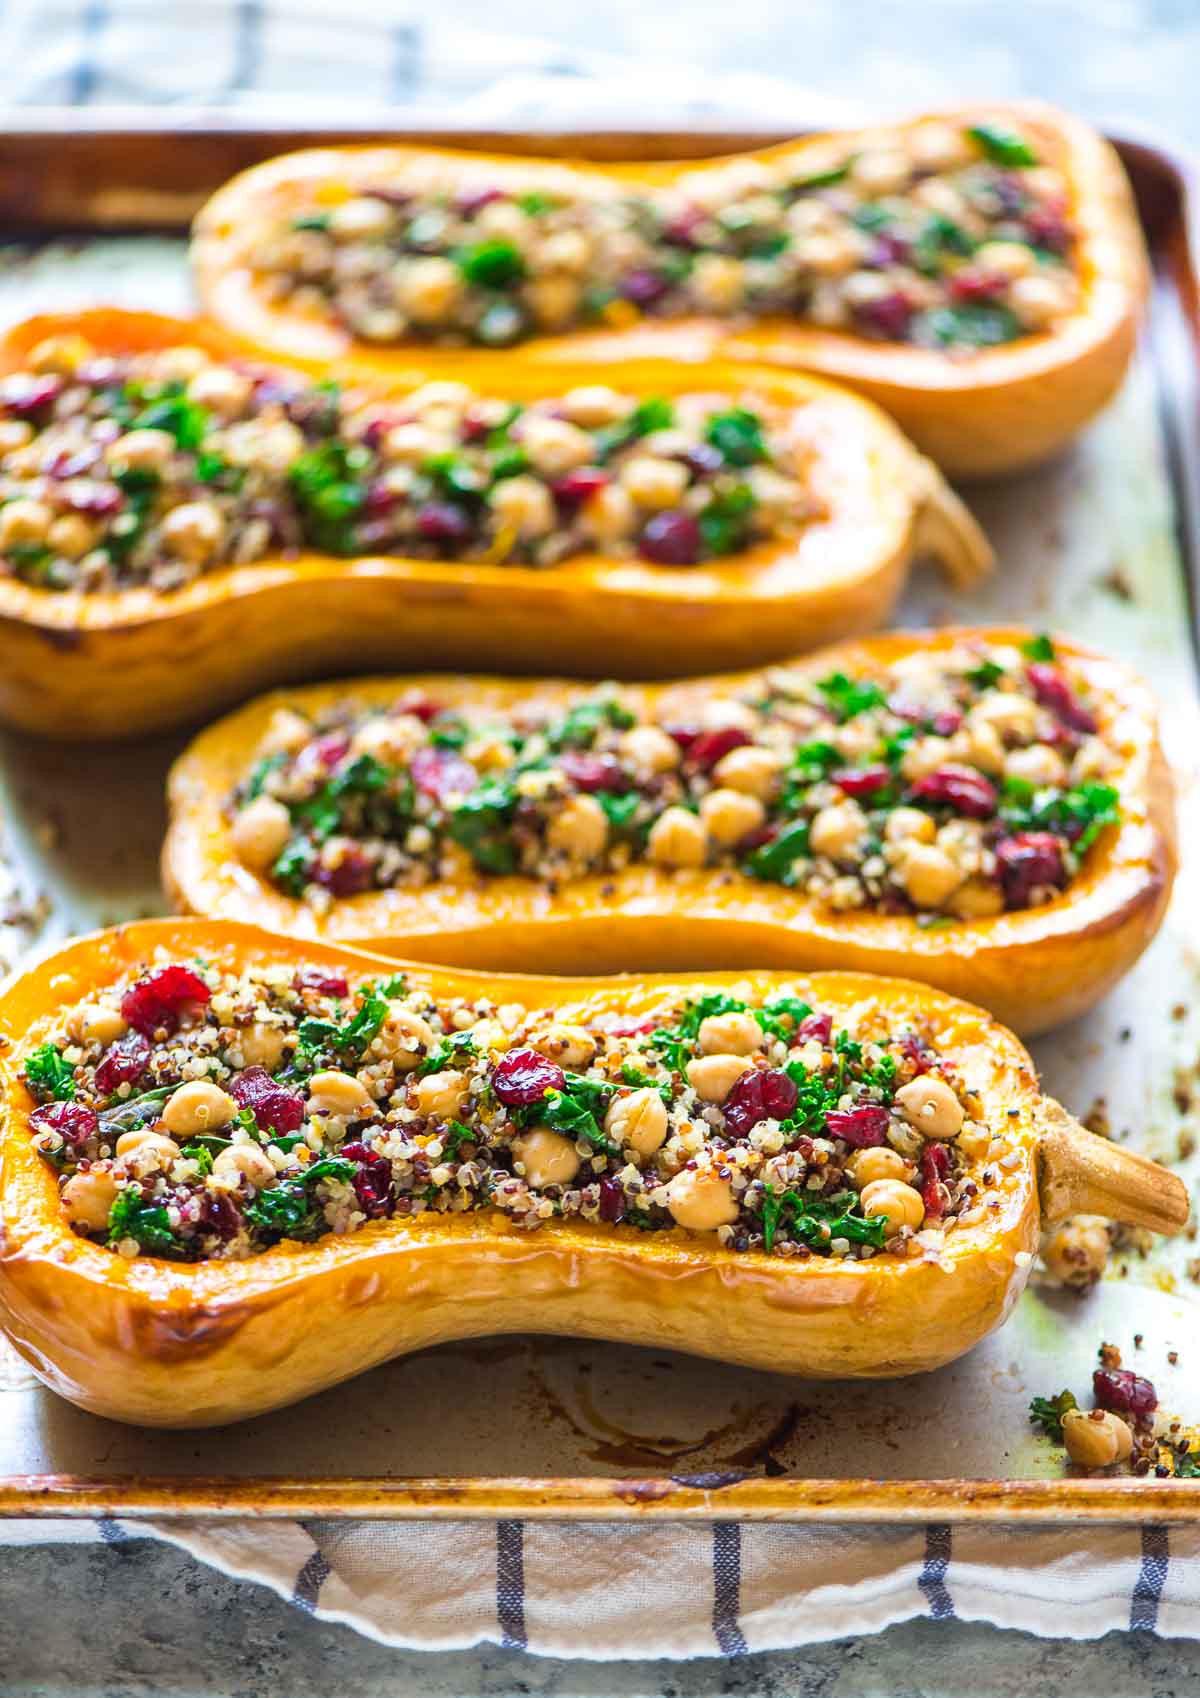 Fall Vegan Recipes  8 Healthy Fall Dinner Recipes MOMables Good Food